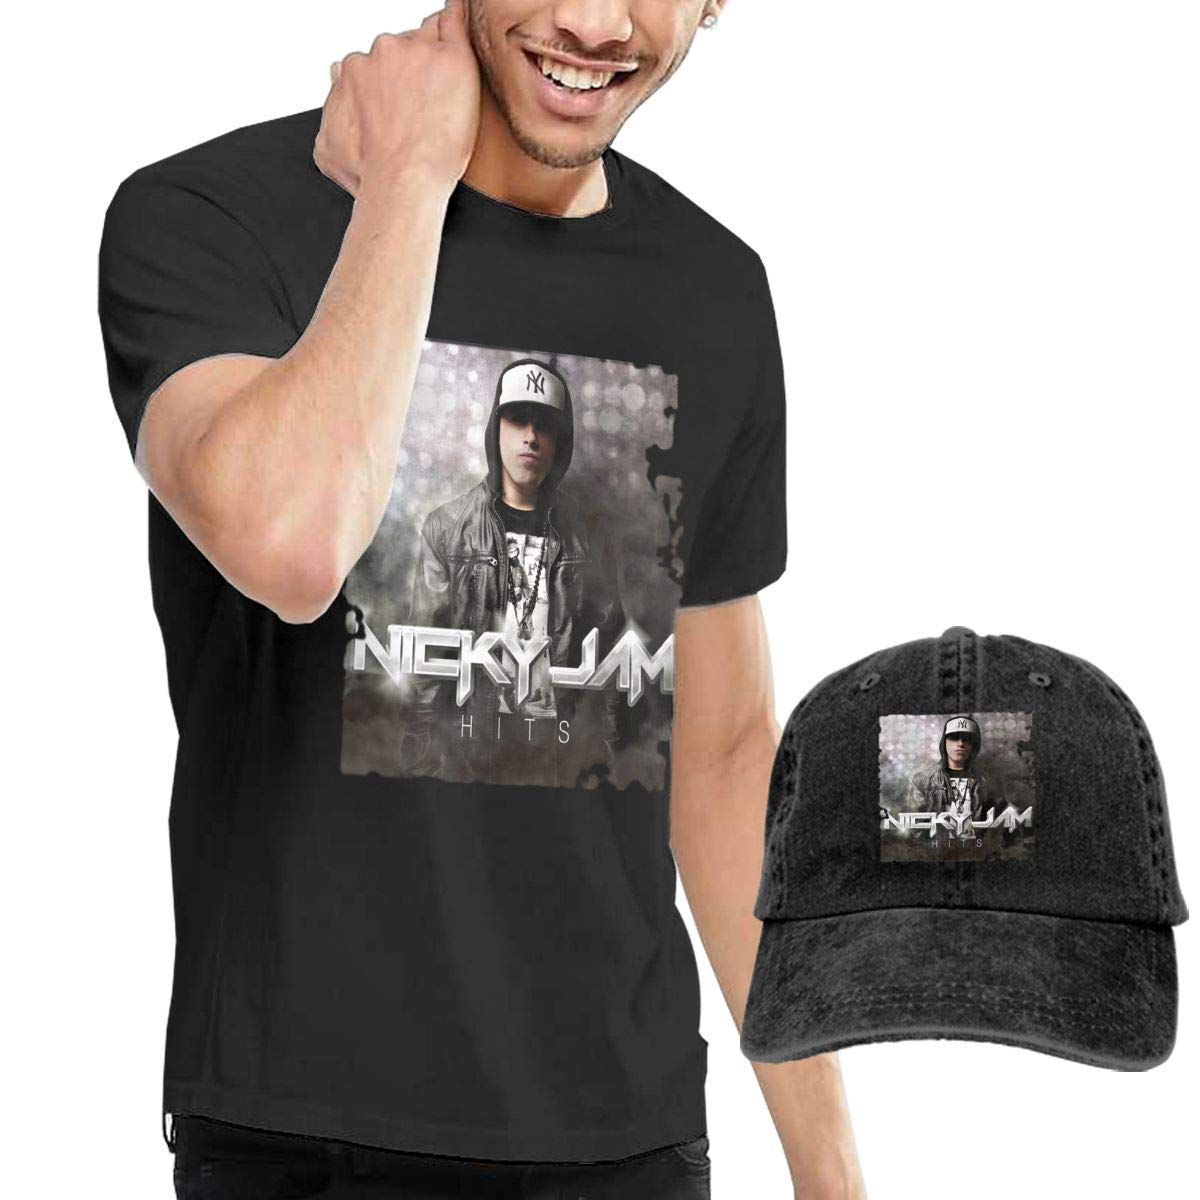 Rosetta Sandy Camisetas de Hombre Nicky Jam Hits y Gorra de ...